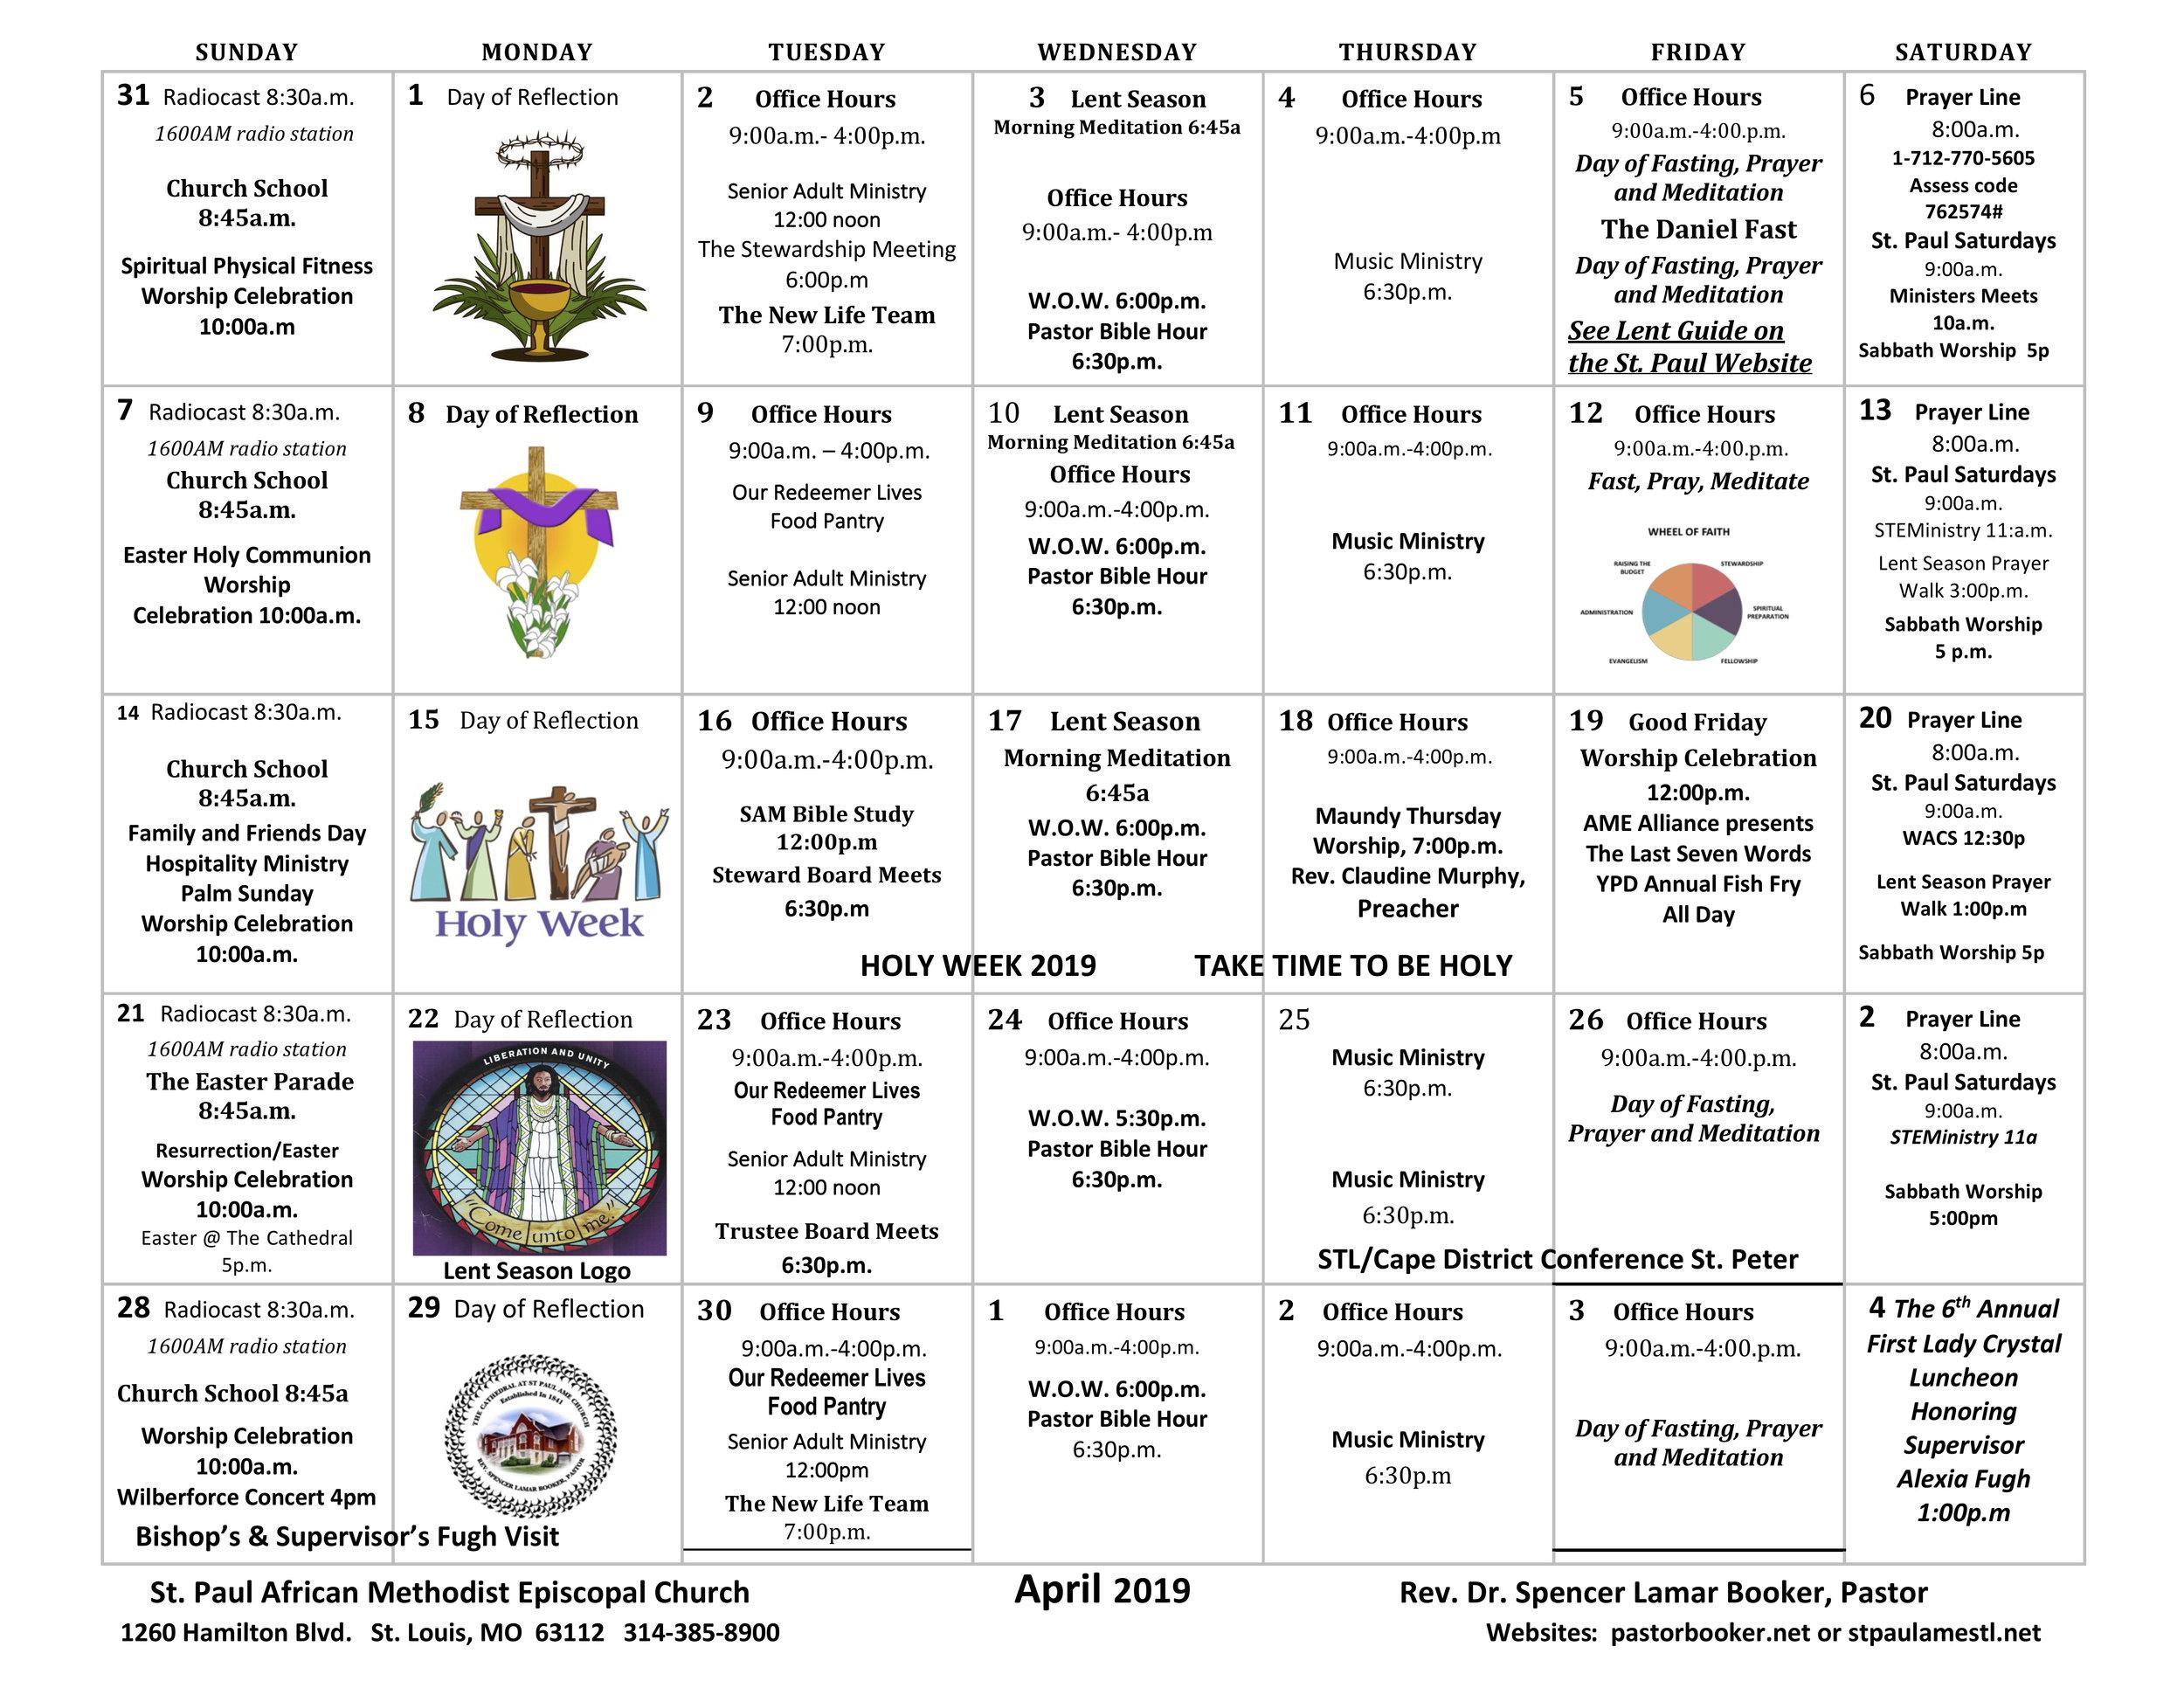 April Calendar 2019 FINAL iiiUPDATE.jpg